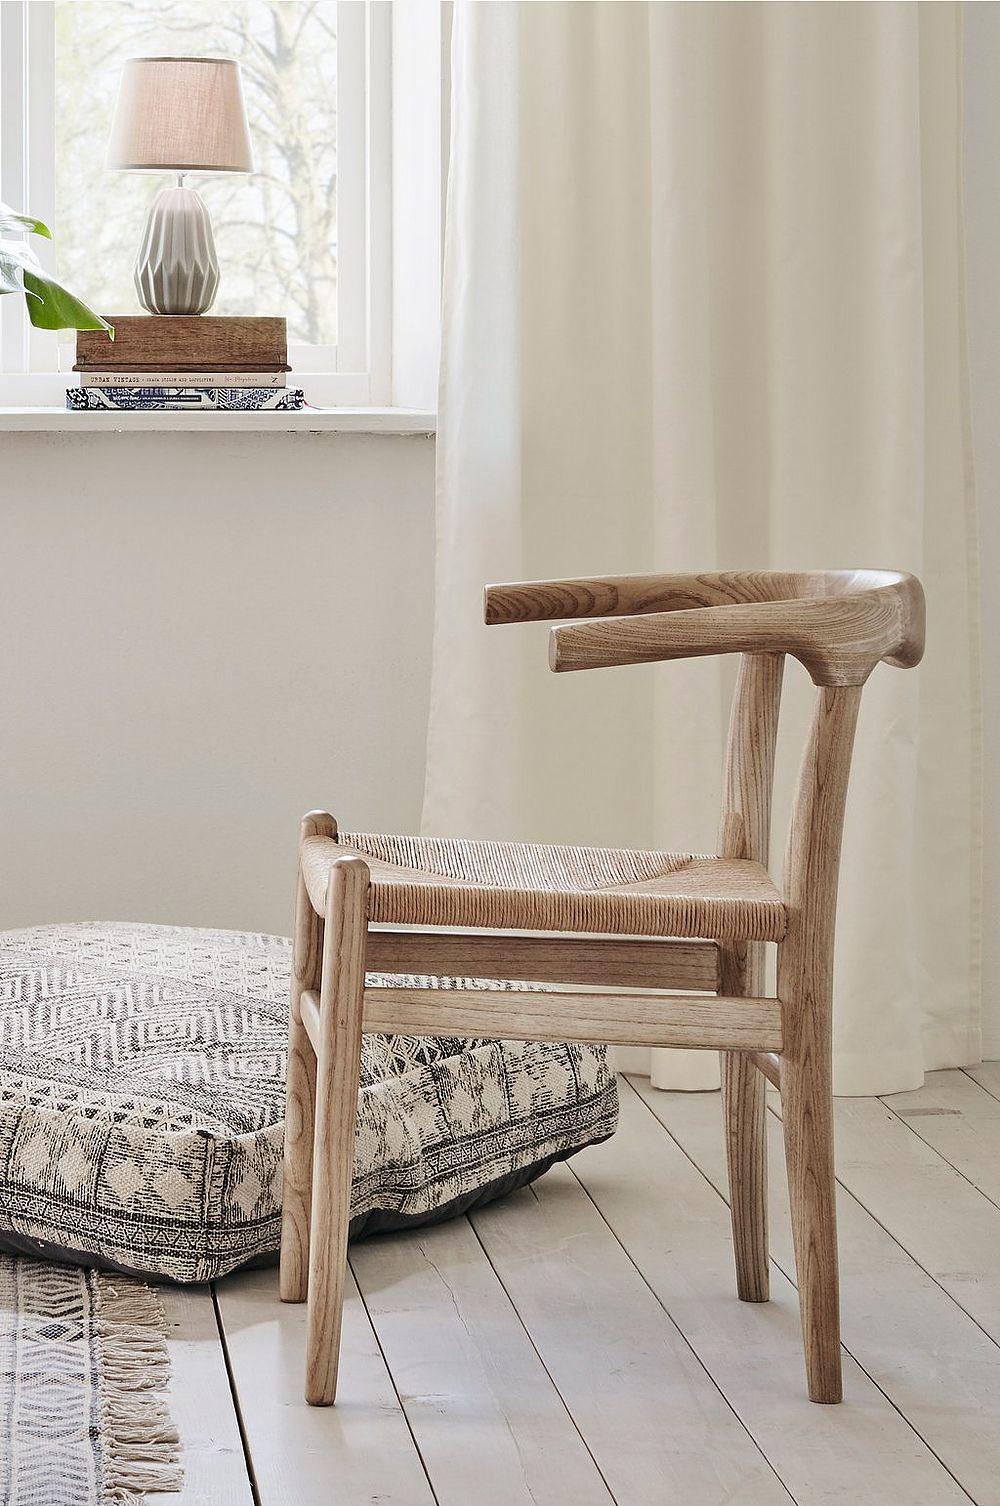 NATTAVAARA stol | Stolar, Möbelidéer, Stol matbord